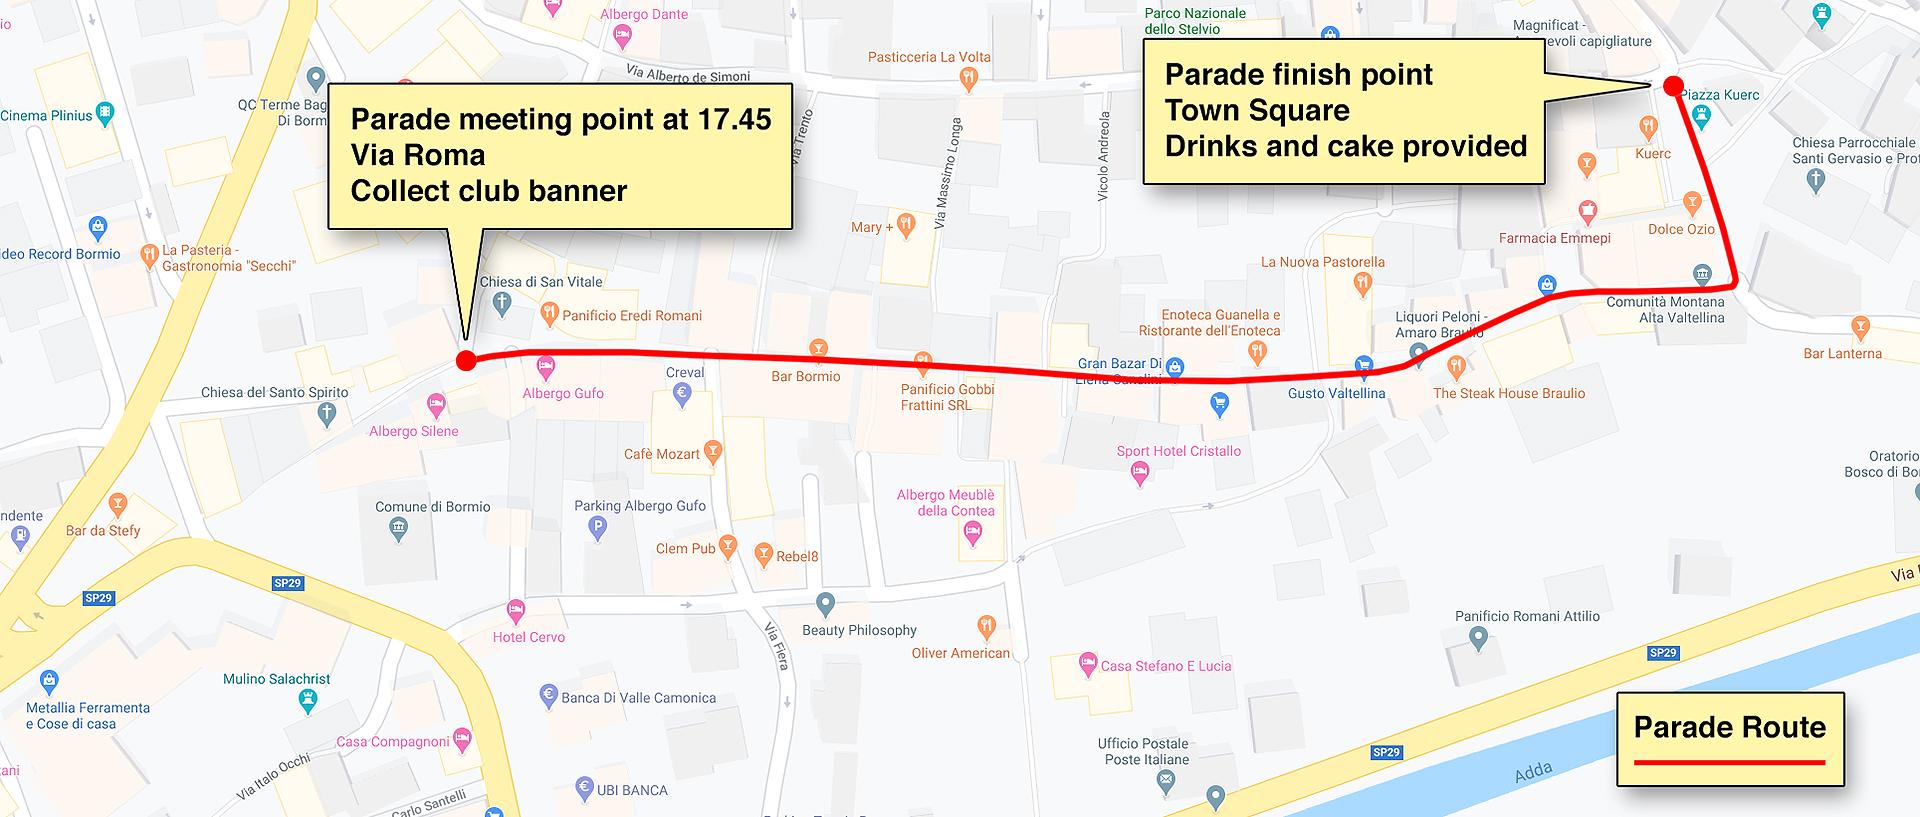 Bormeo Parade Route